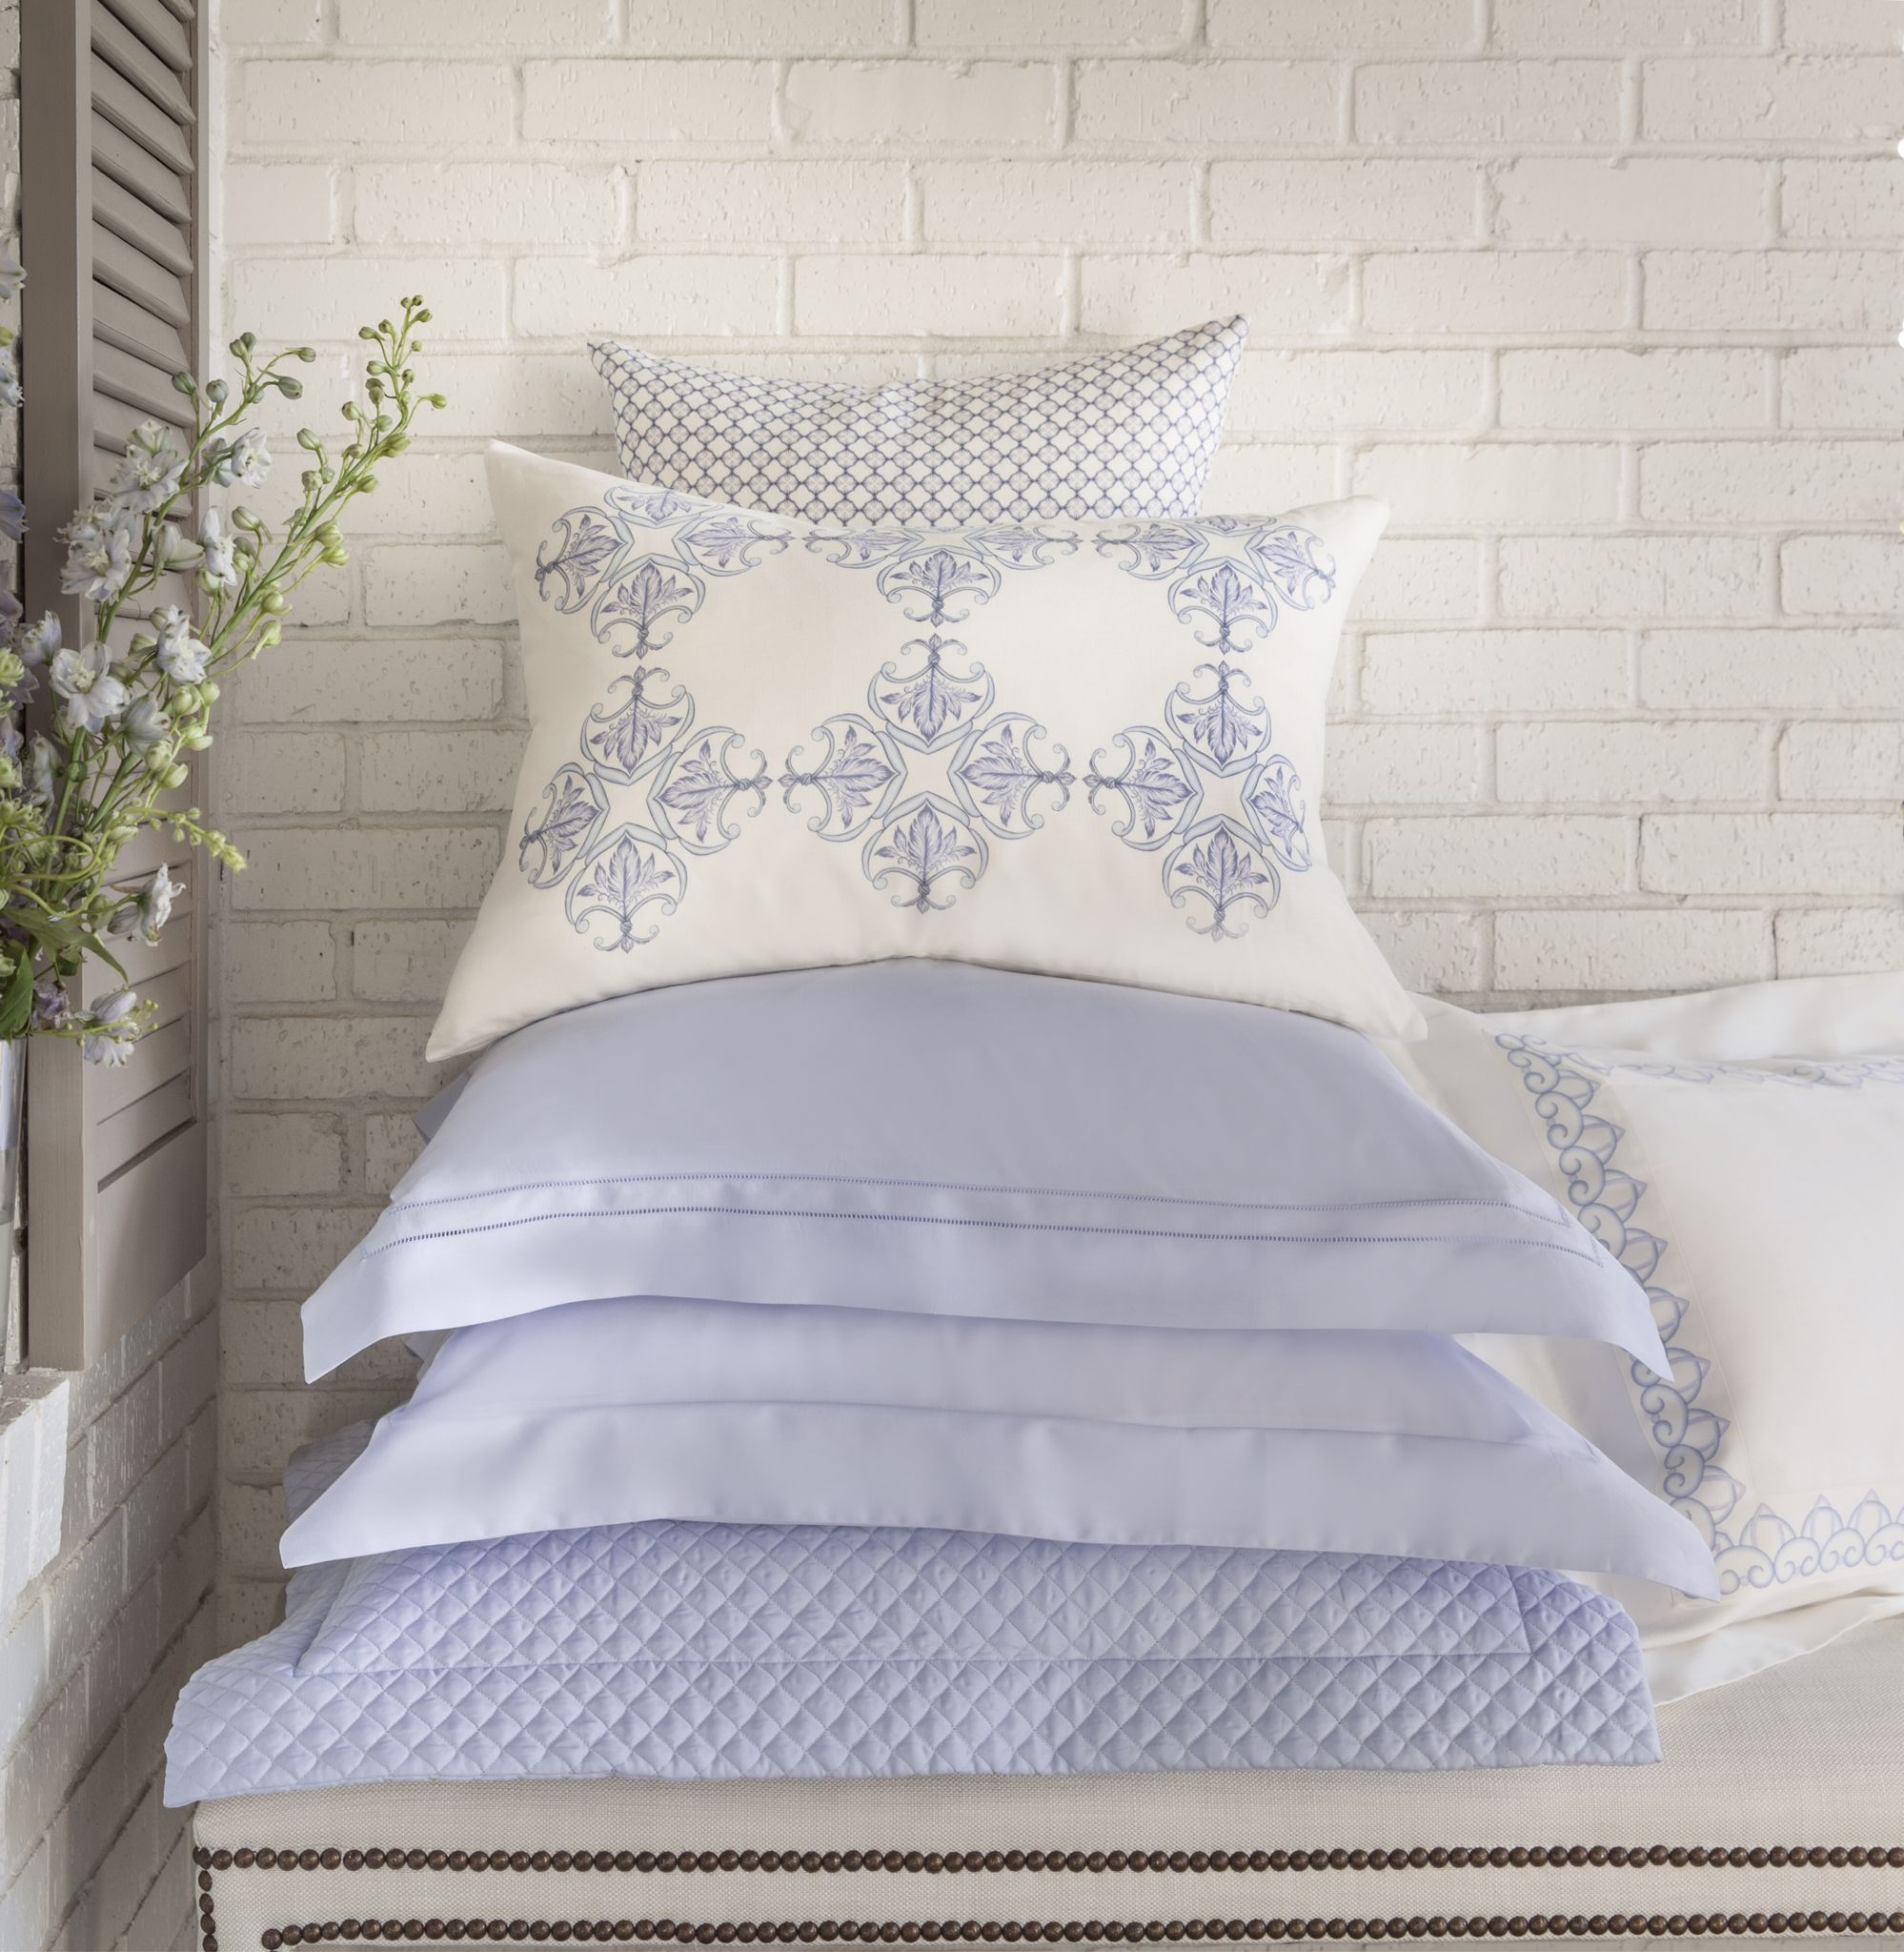 Tribute Goods Fine Linens Luxury Italian Bedding And Home Goods